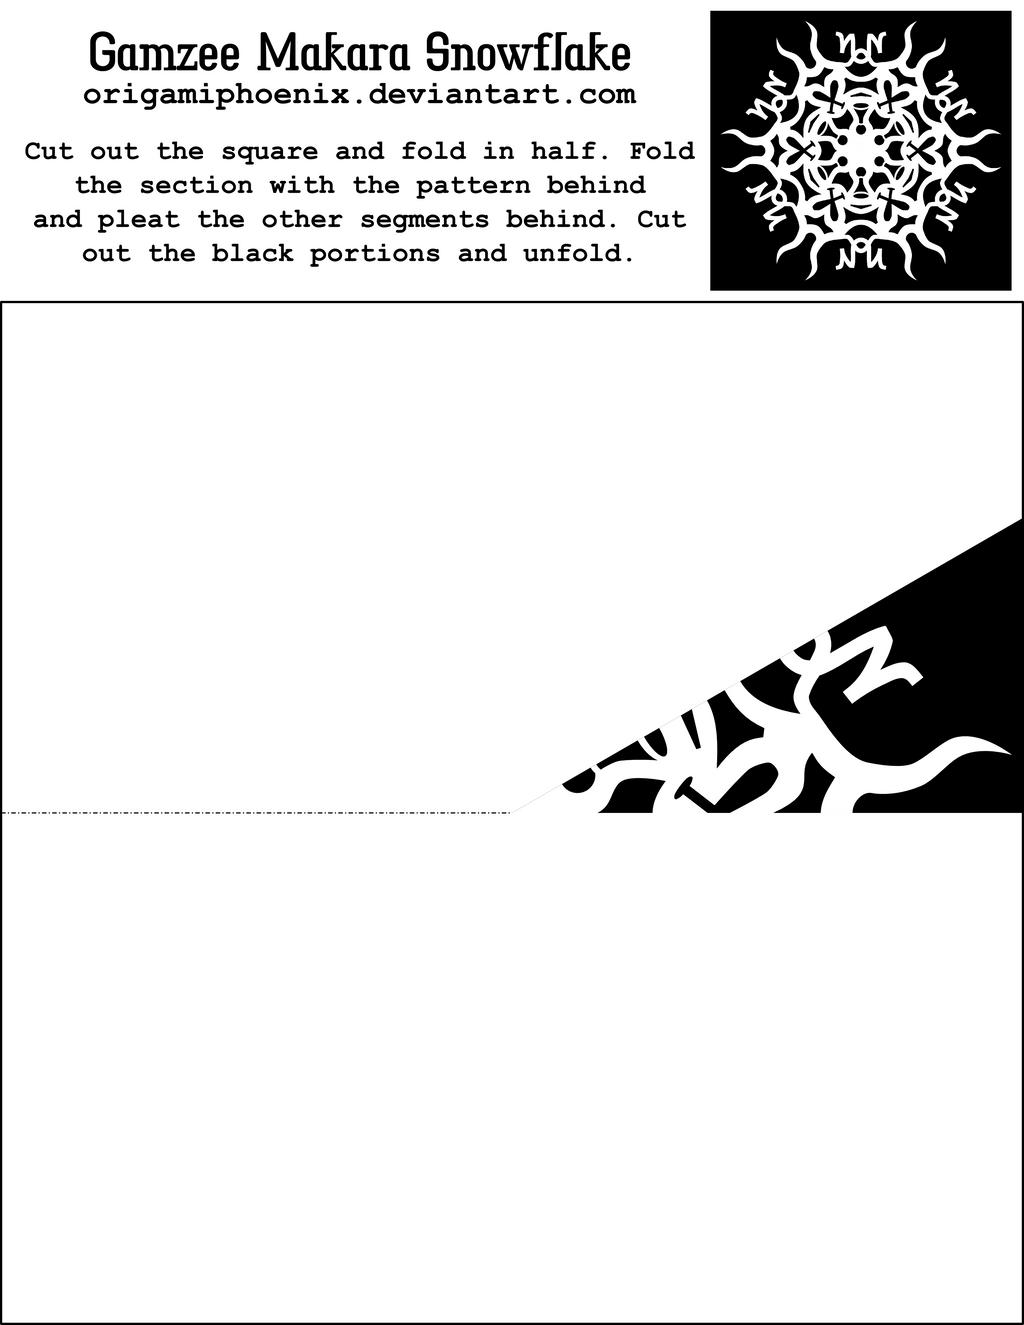 Gamzee Makara Snowflake Printout by OrigamiPhoenix on DeviantArt